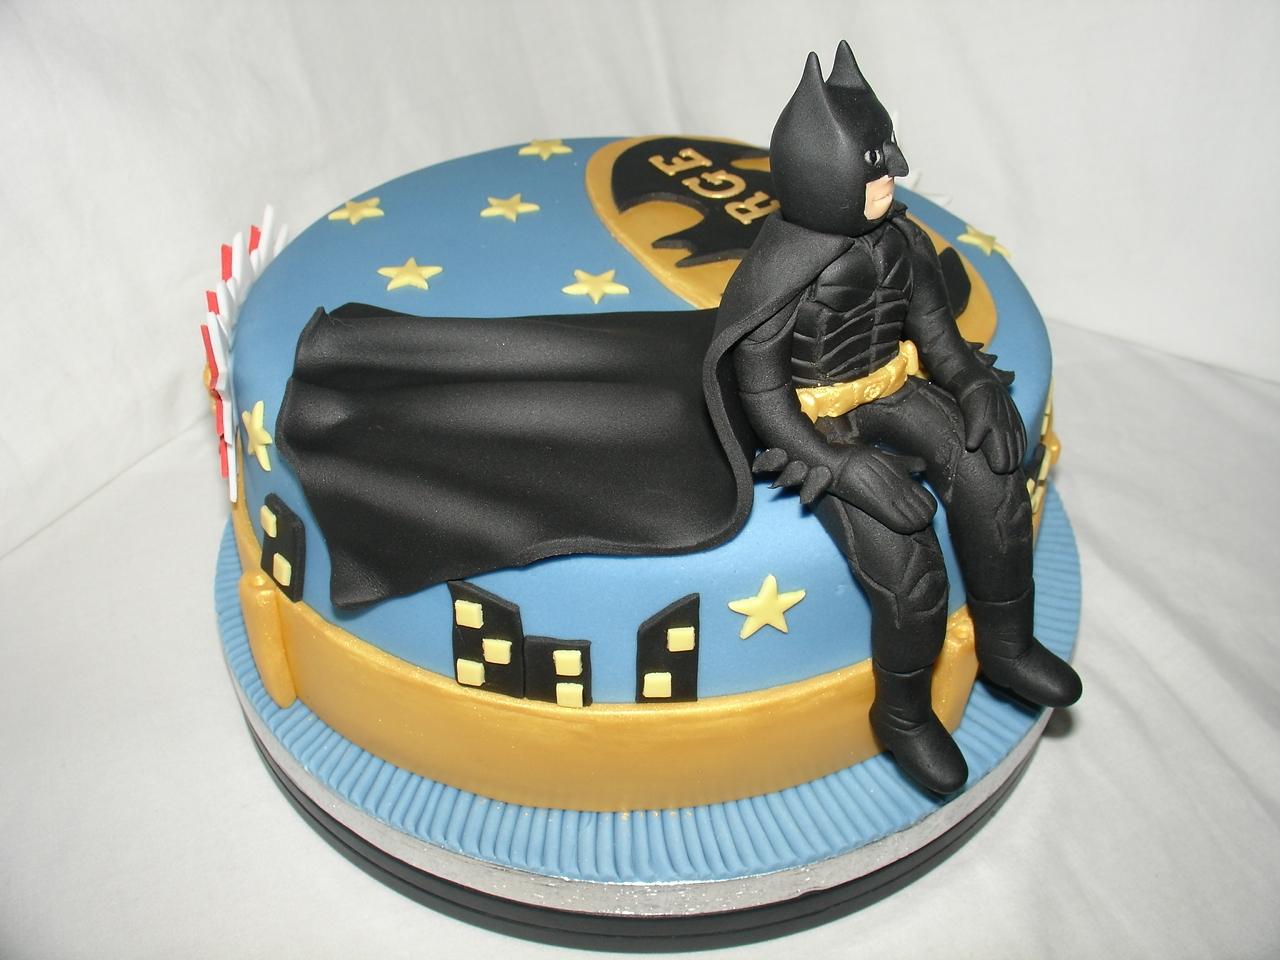 Batman The Dark Knight Fondant Cake CakeCentralcom - Dark knight birthday cake